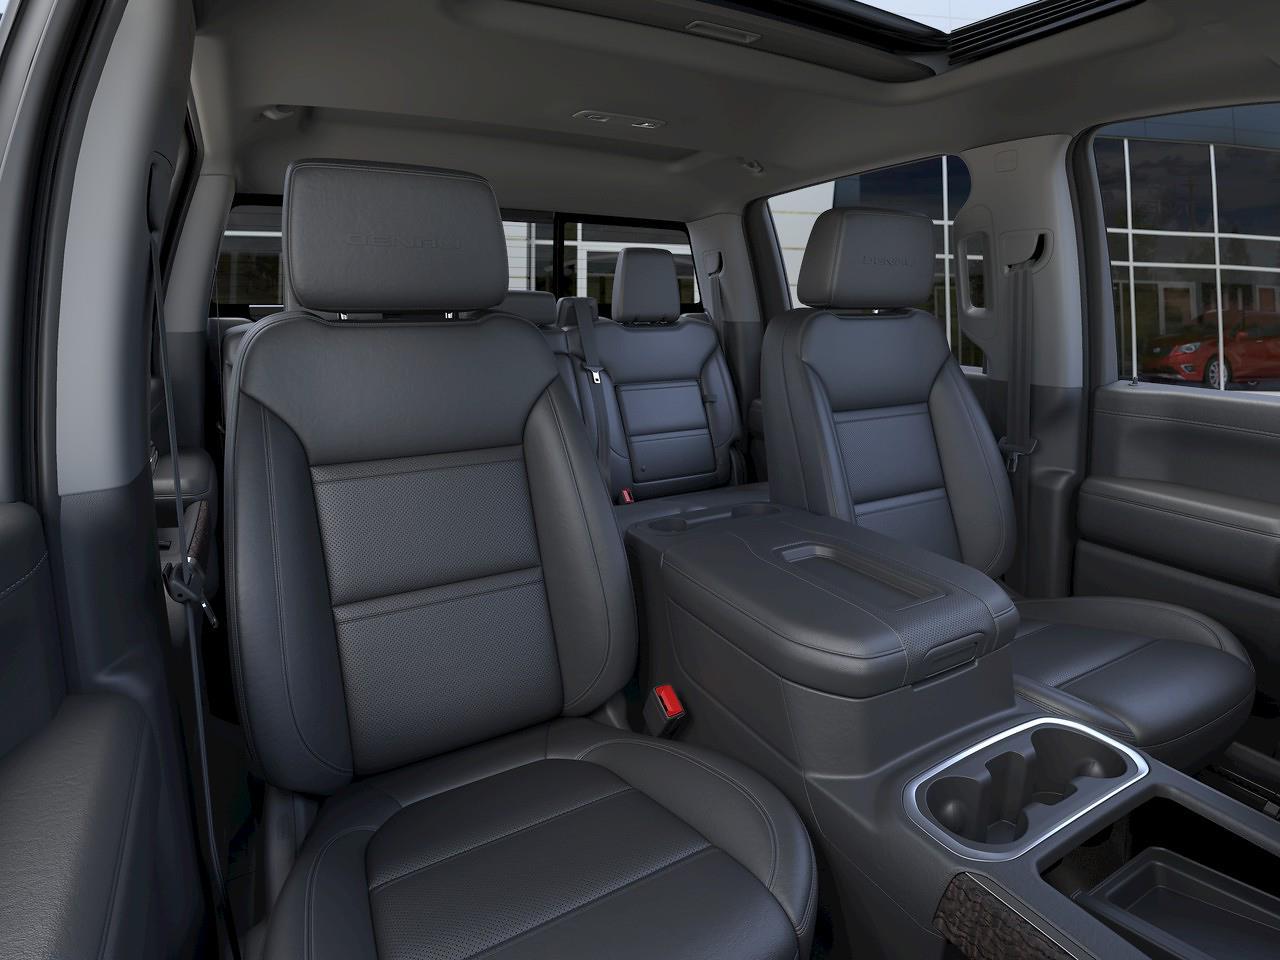 2021 GMC Sierra 3500 Crew Cab 4x4, Pickup #GM12147 - photo 13